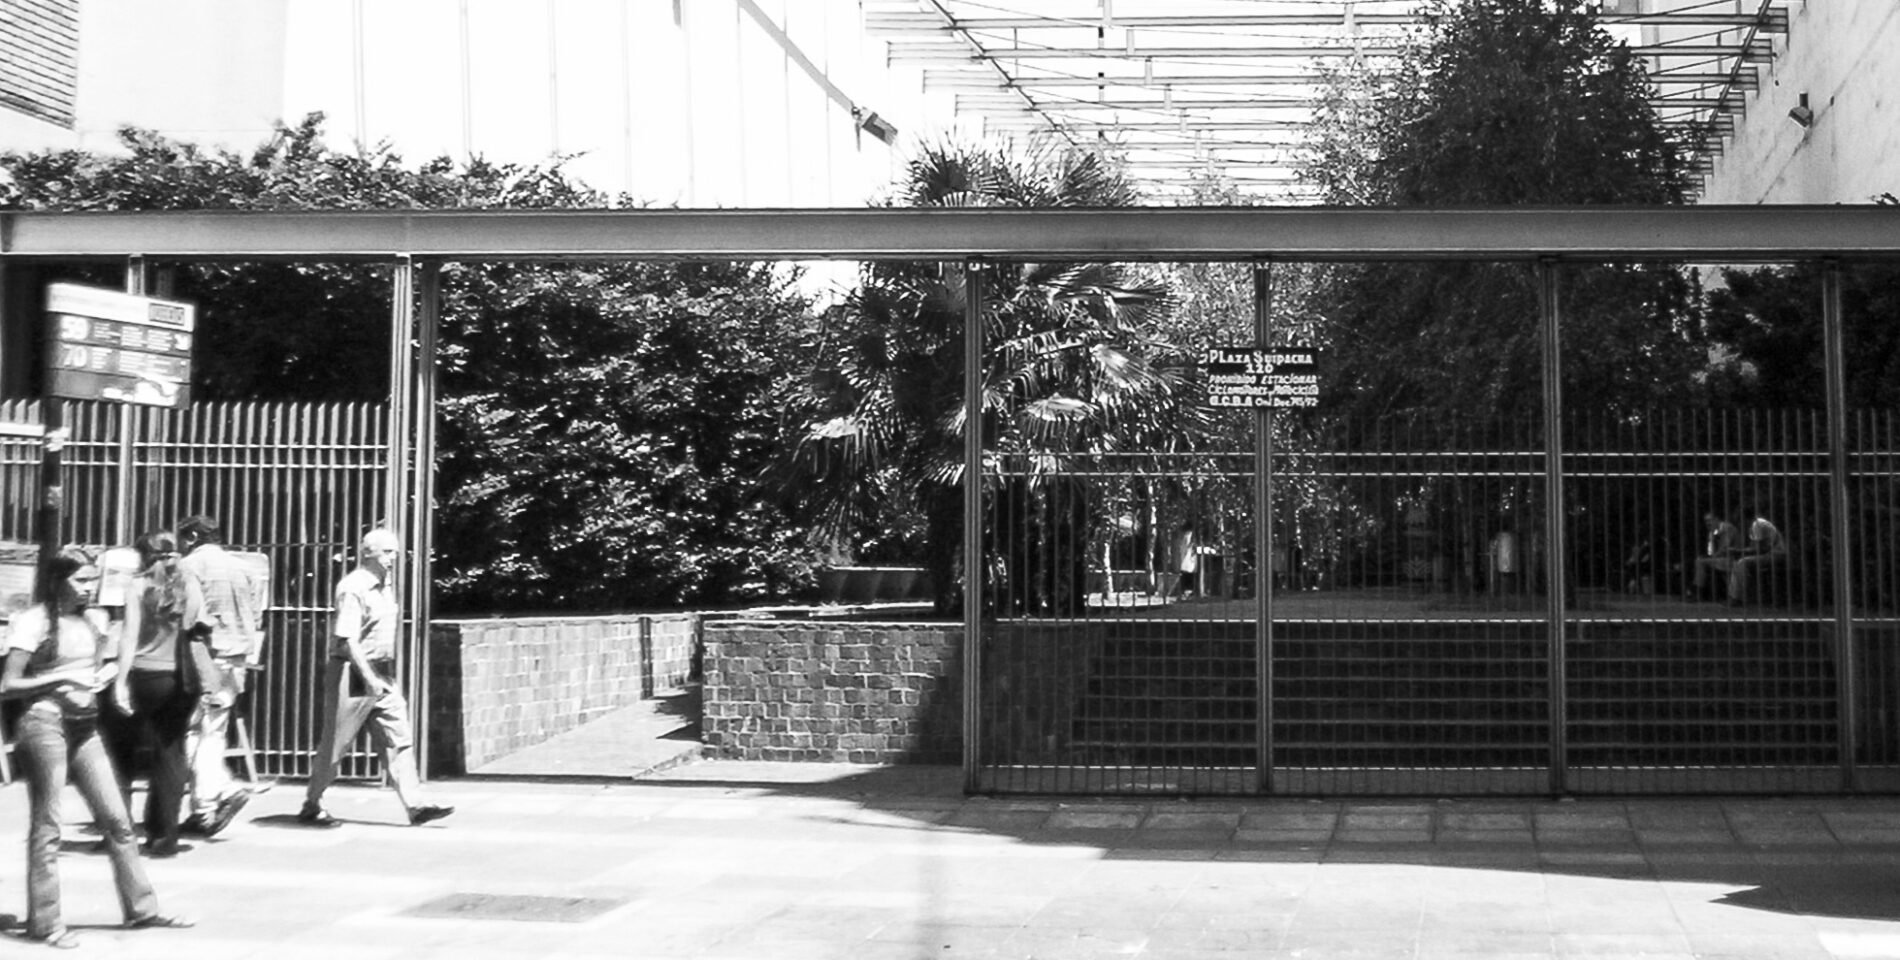 plaza-suipacha-8